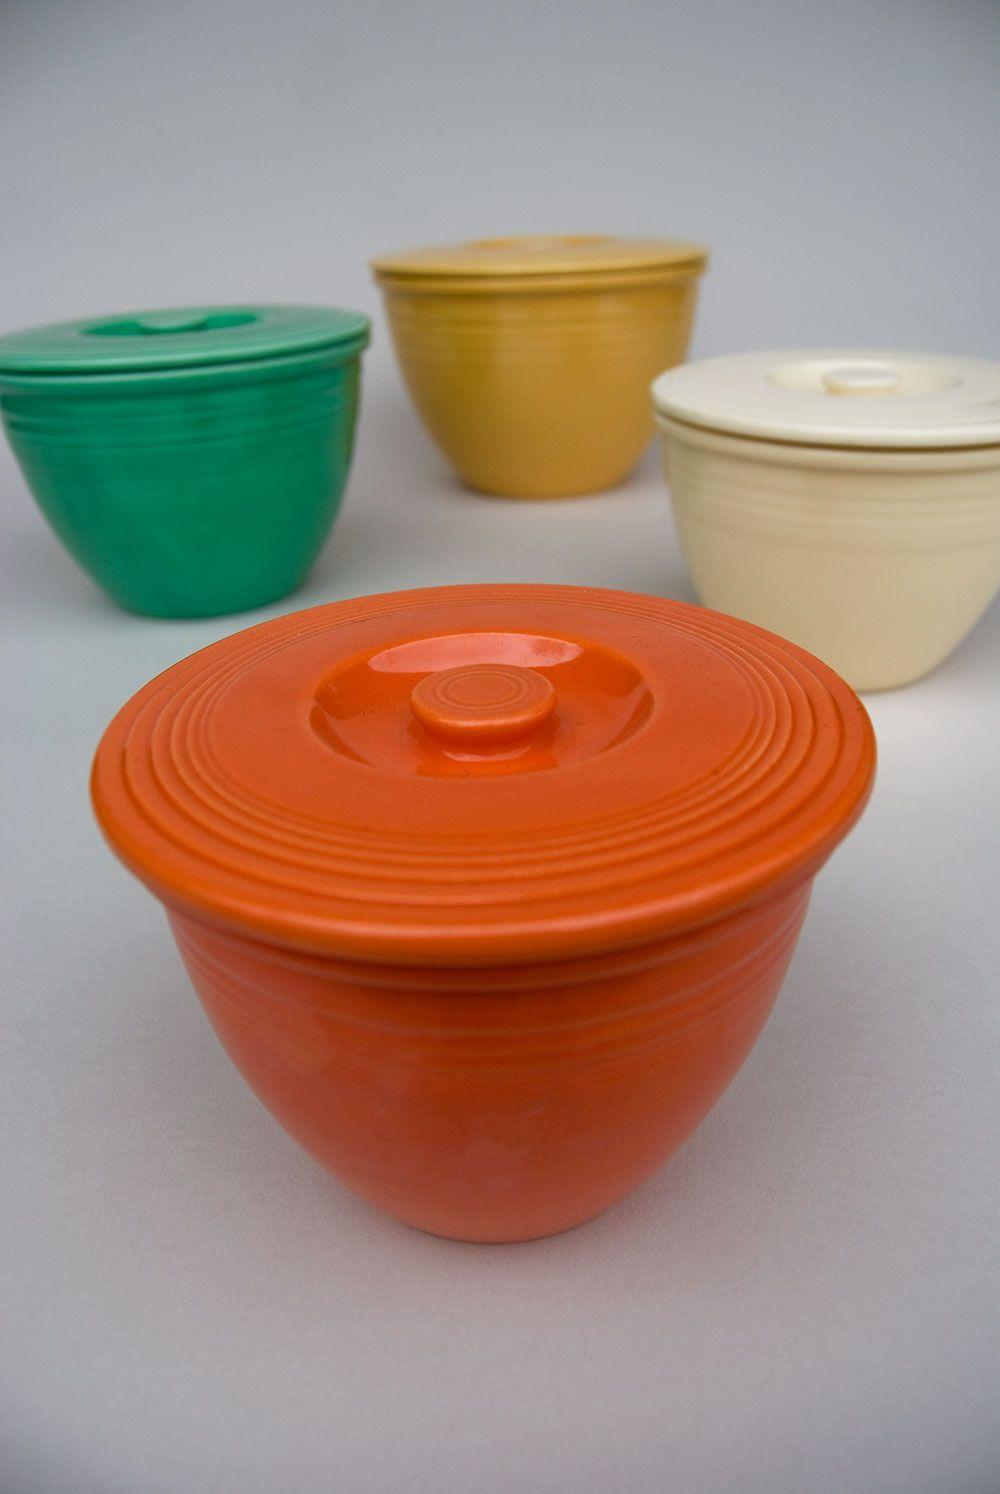 Vintage Fiestaware Nesting Bowl Lids: Radioactive Red, Rare Fiesta ...